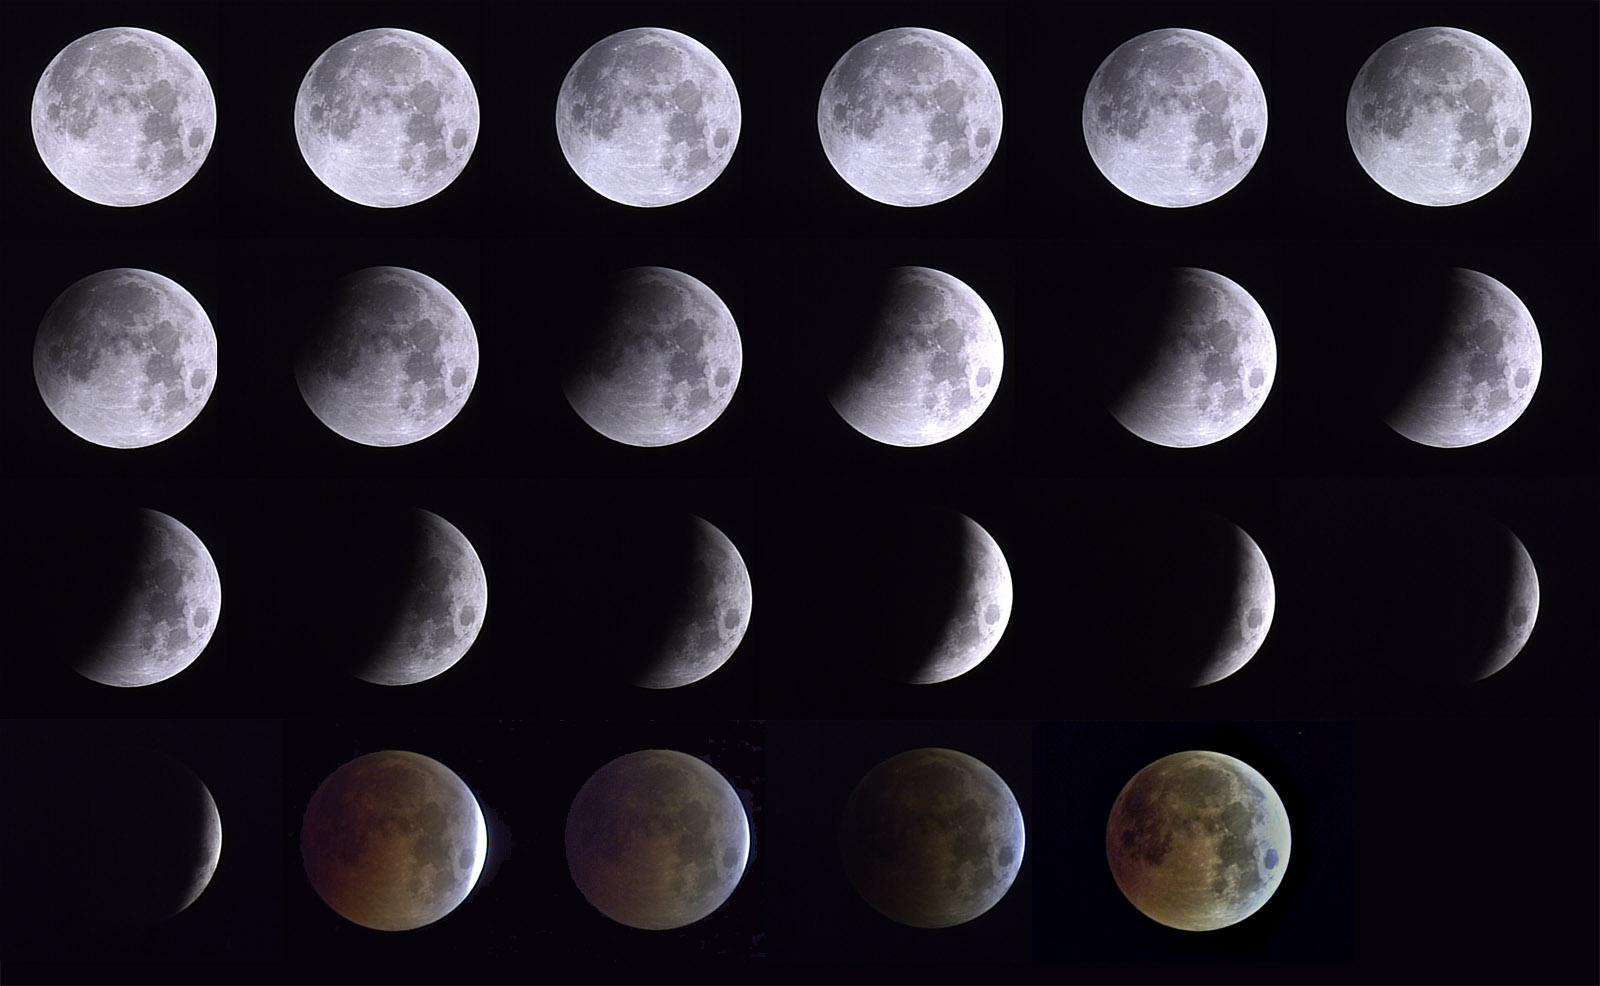 lunar_eclipse10_27_04_copy